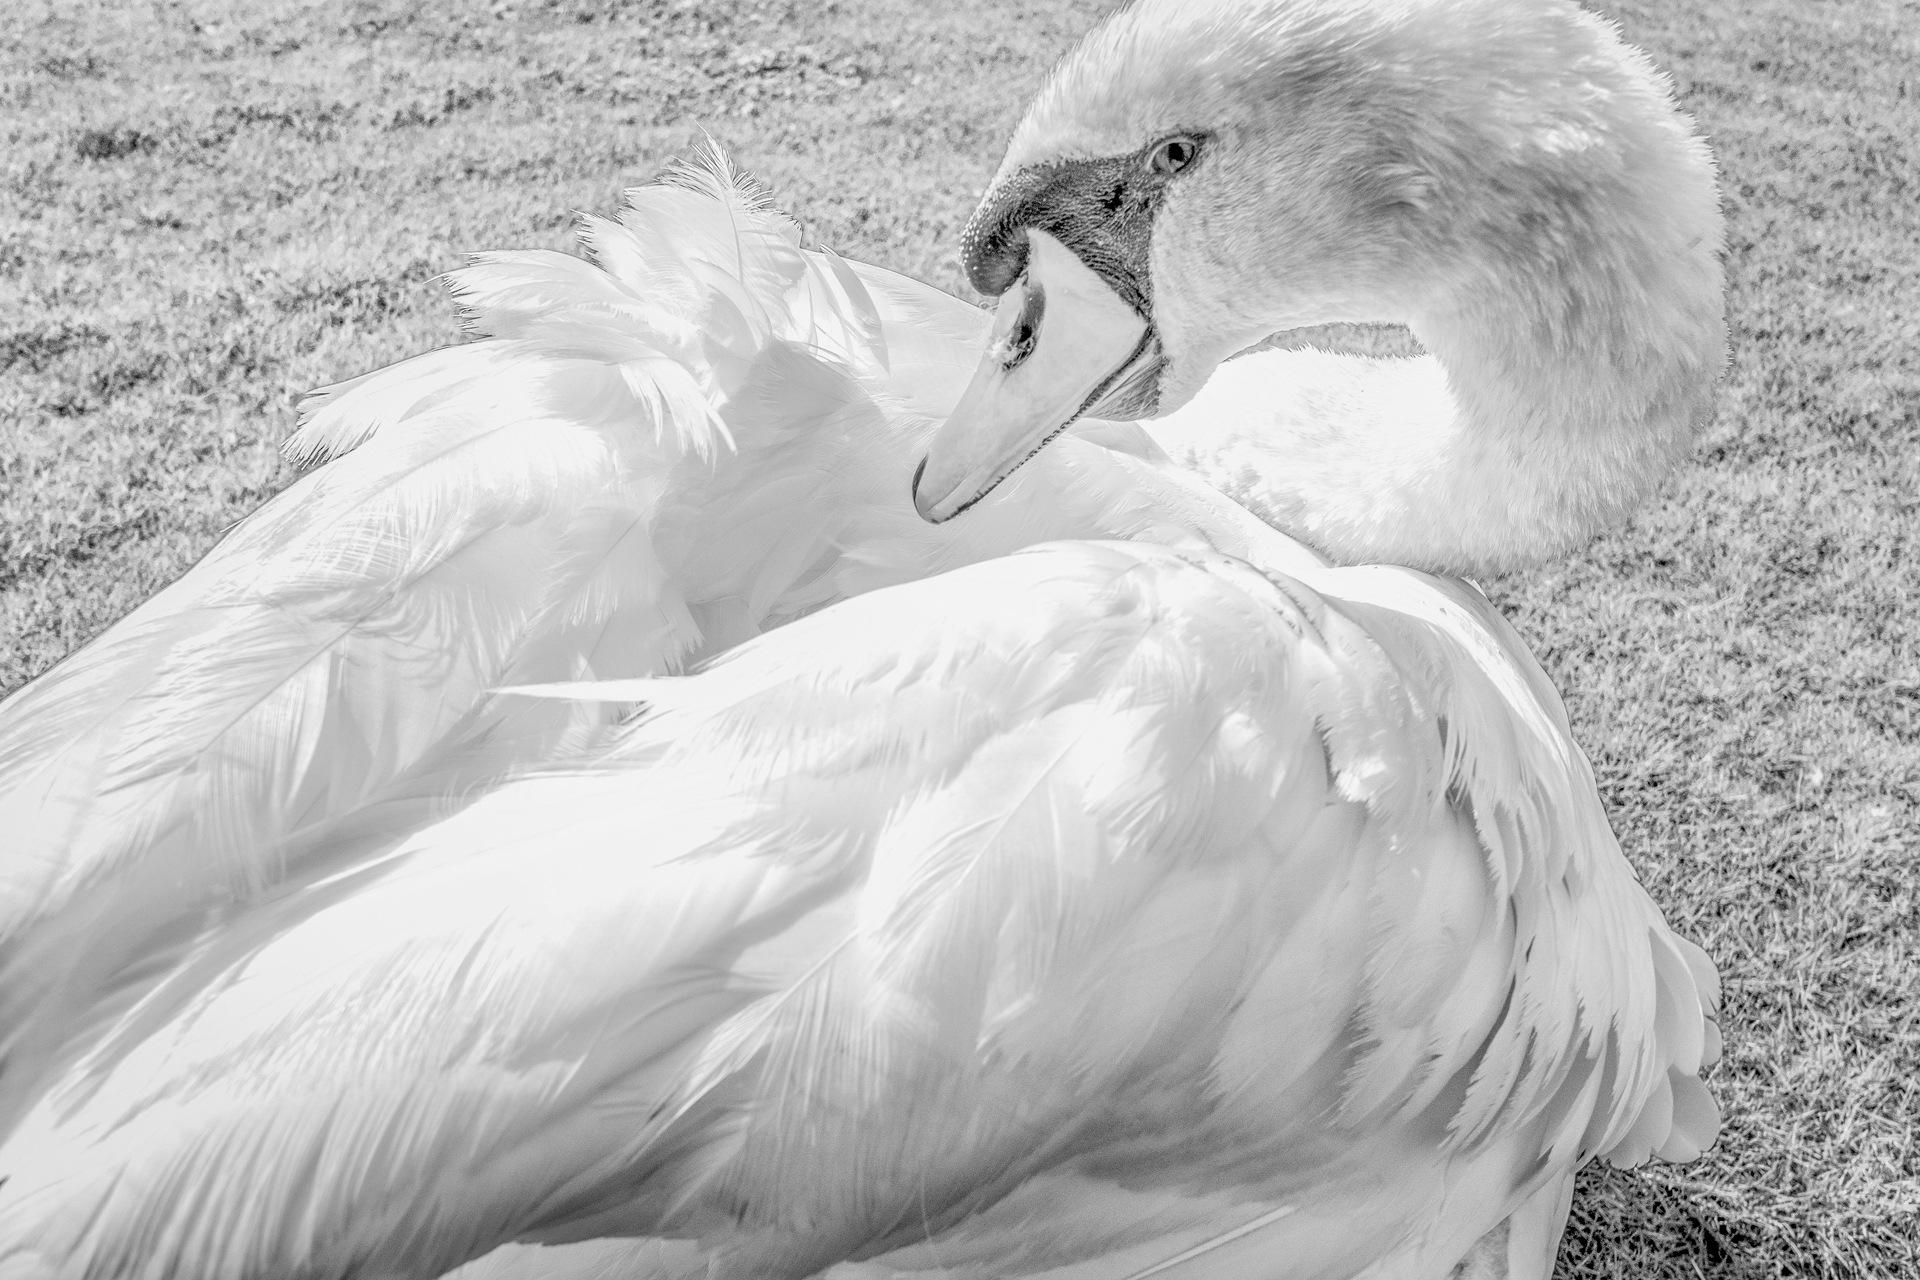 Swan in B&W by Venelin Todorov